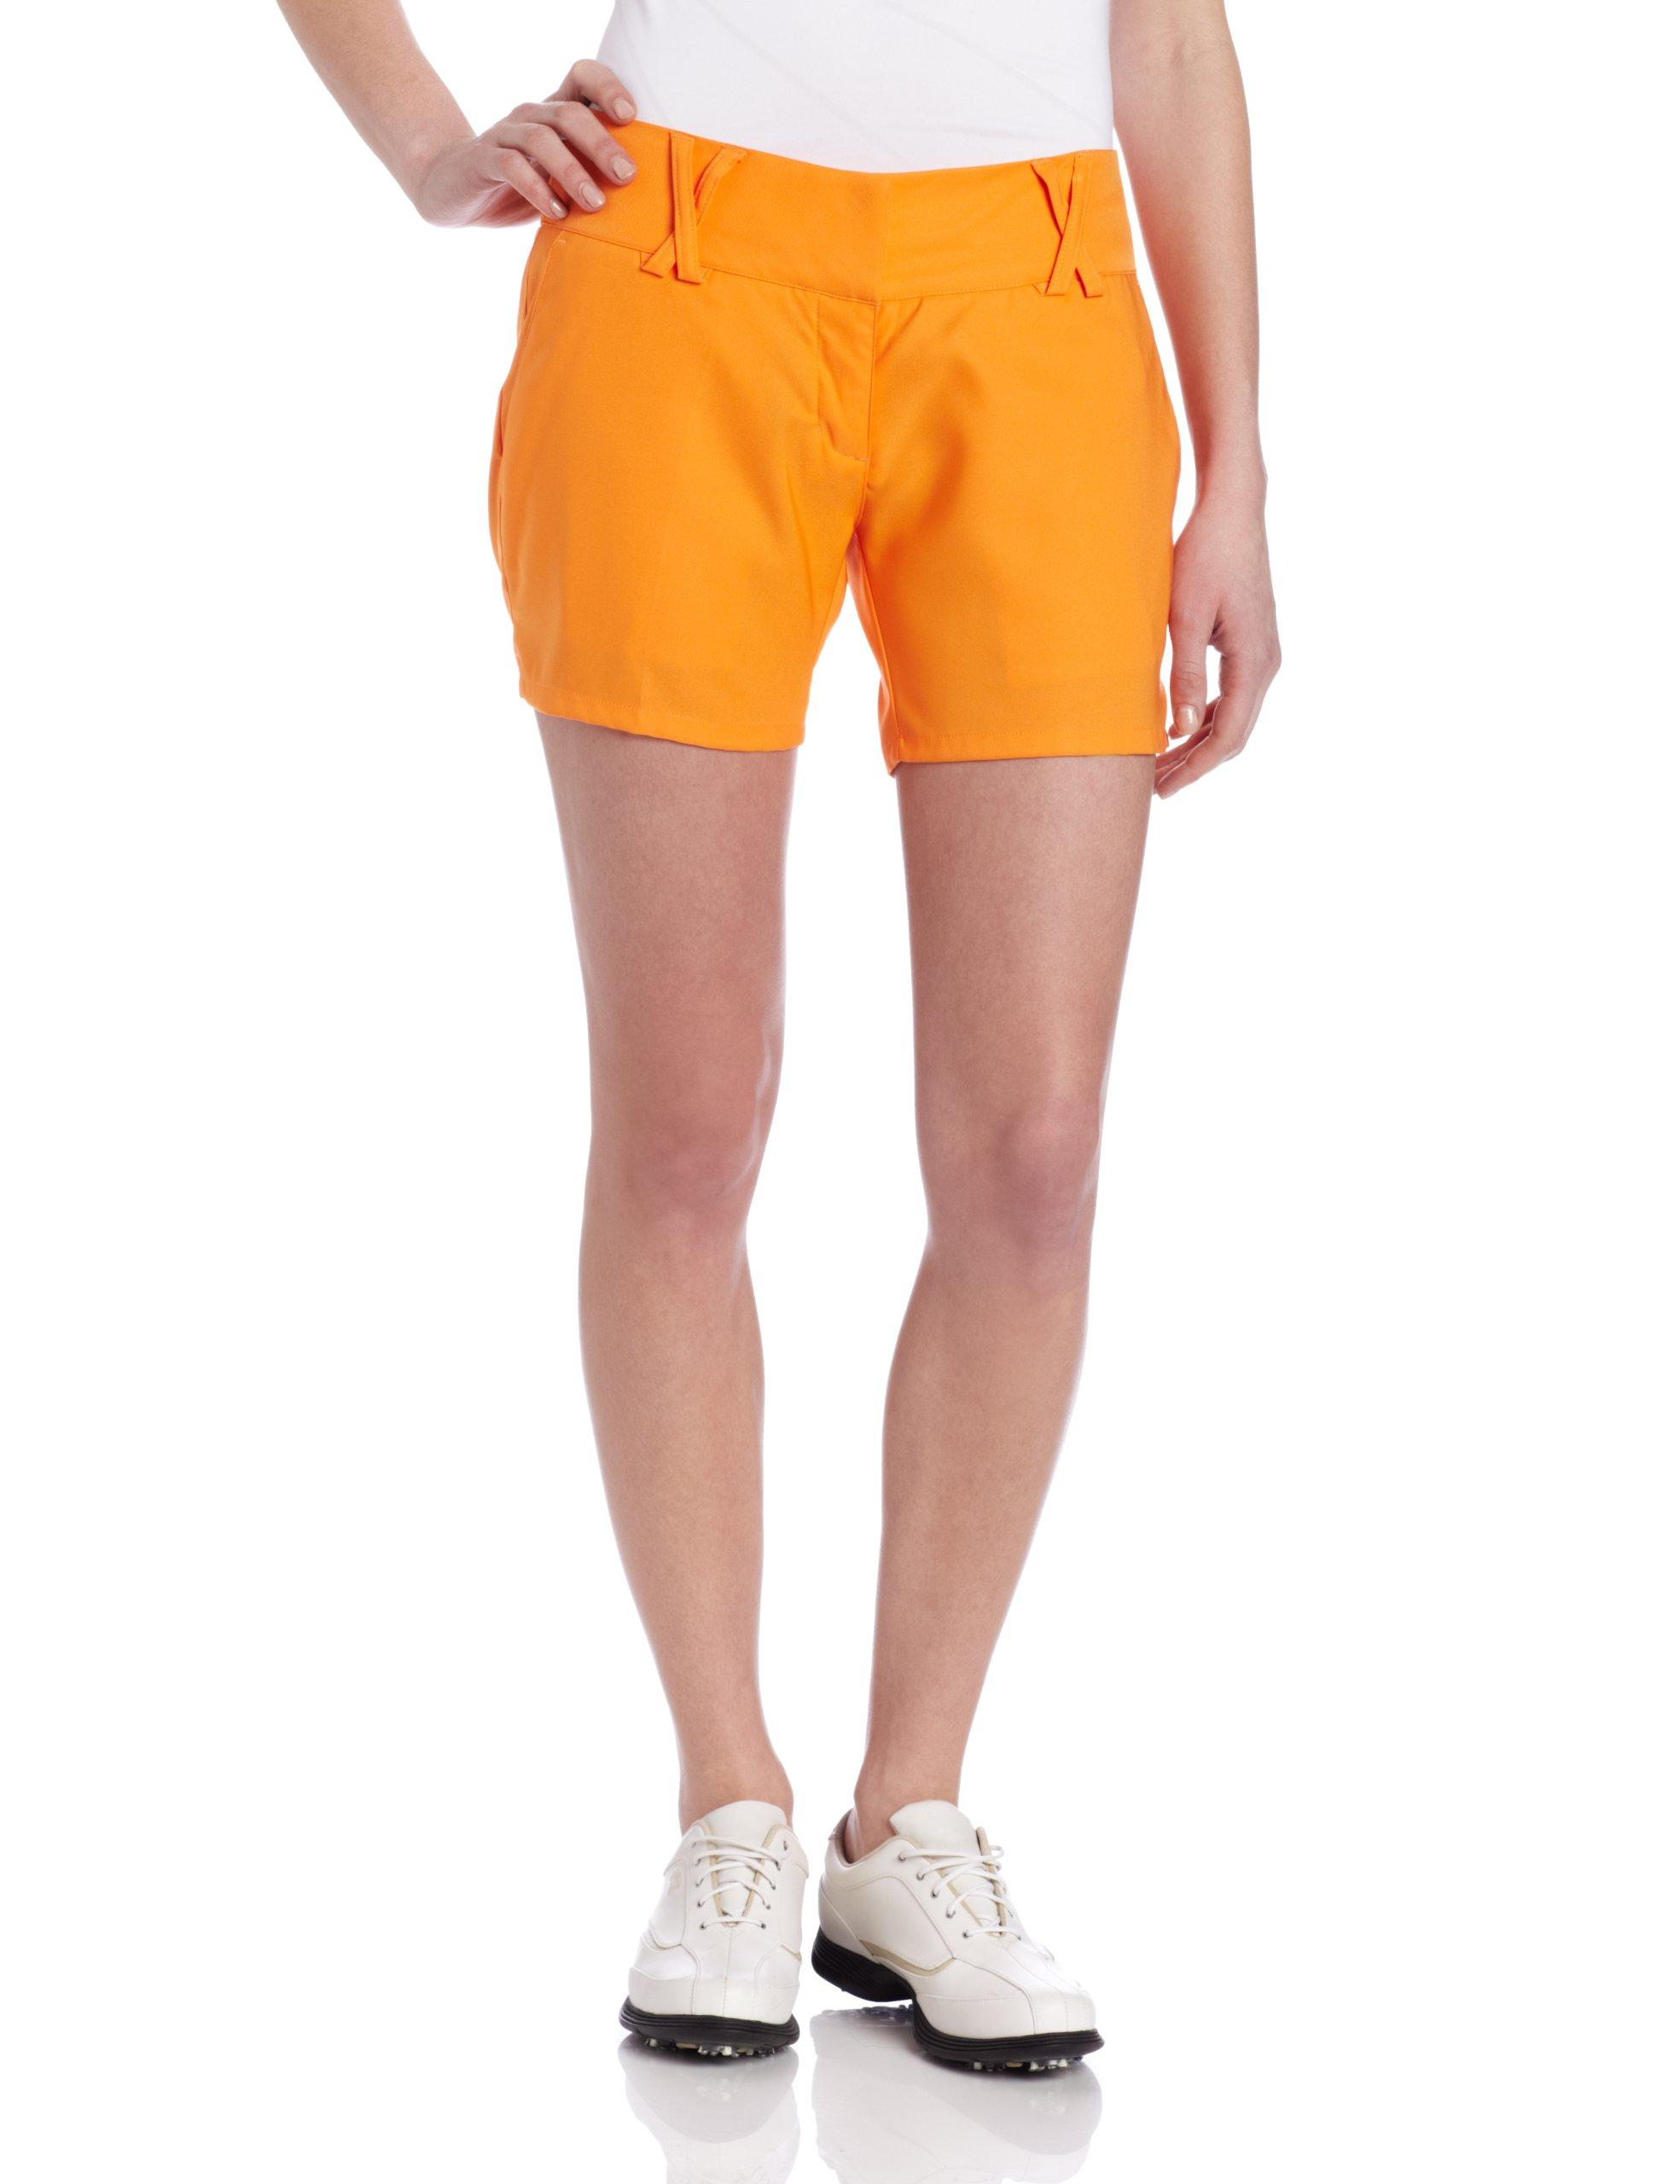 adidas Climalite Stretch Novelty Short, 10-Inch, Sunset